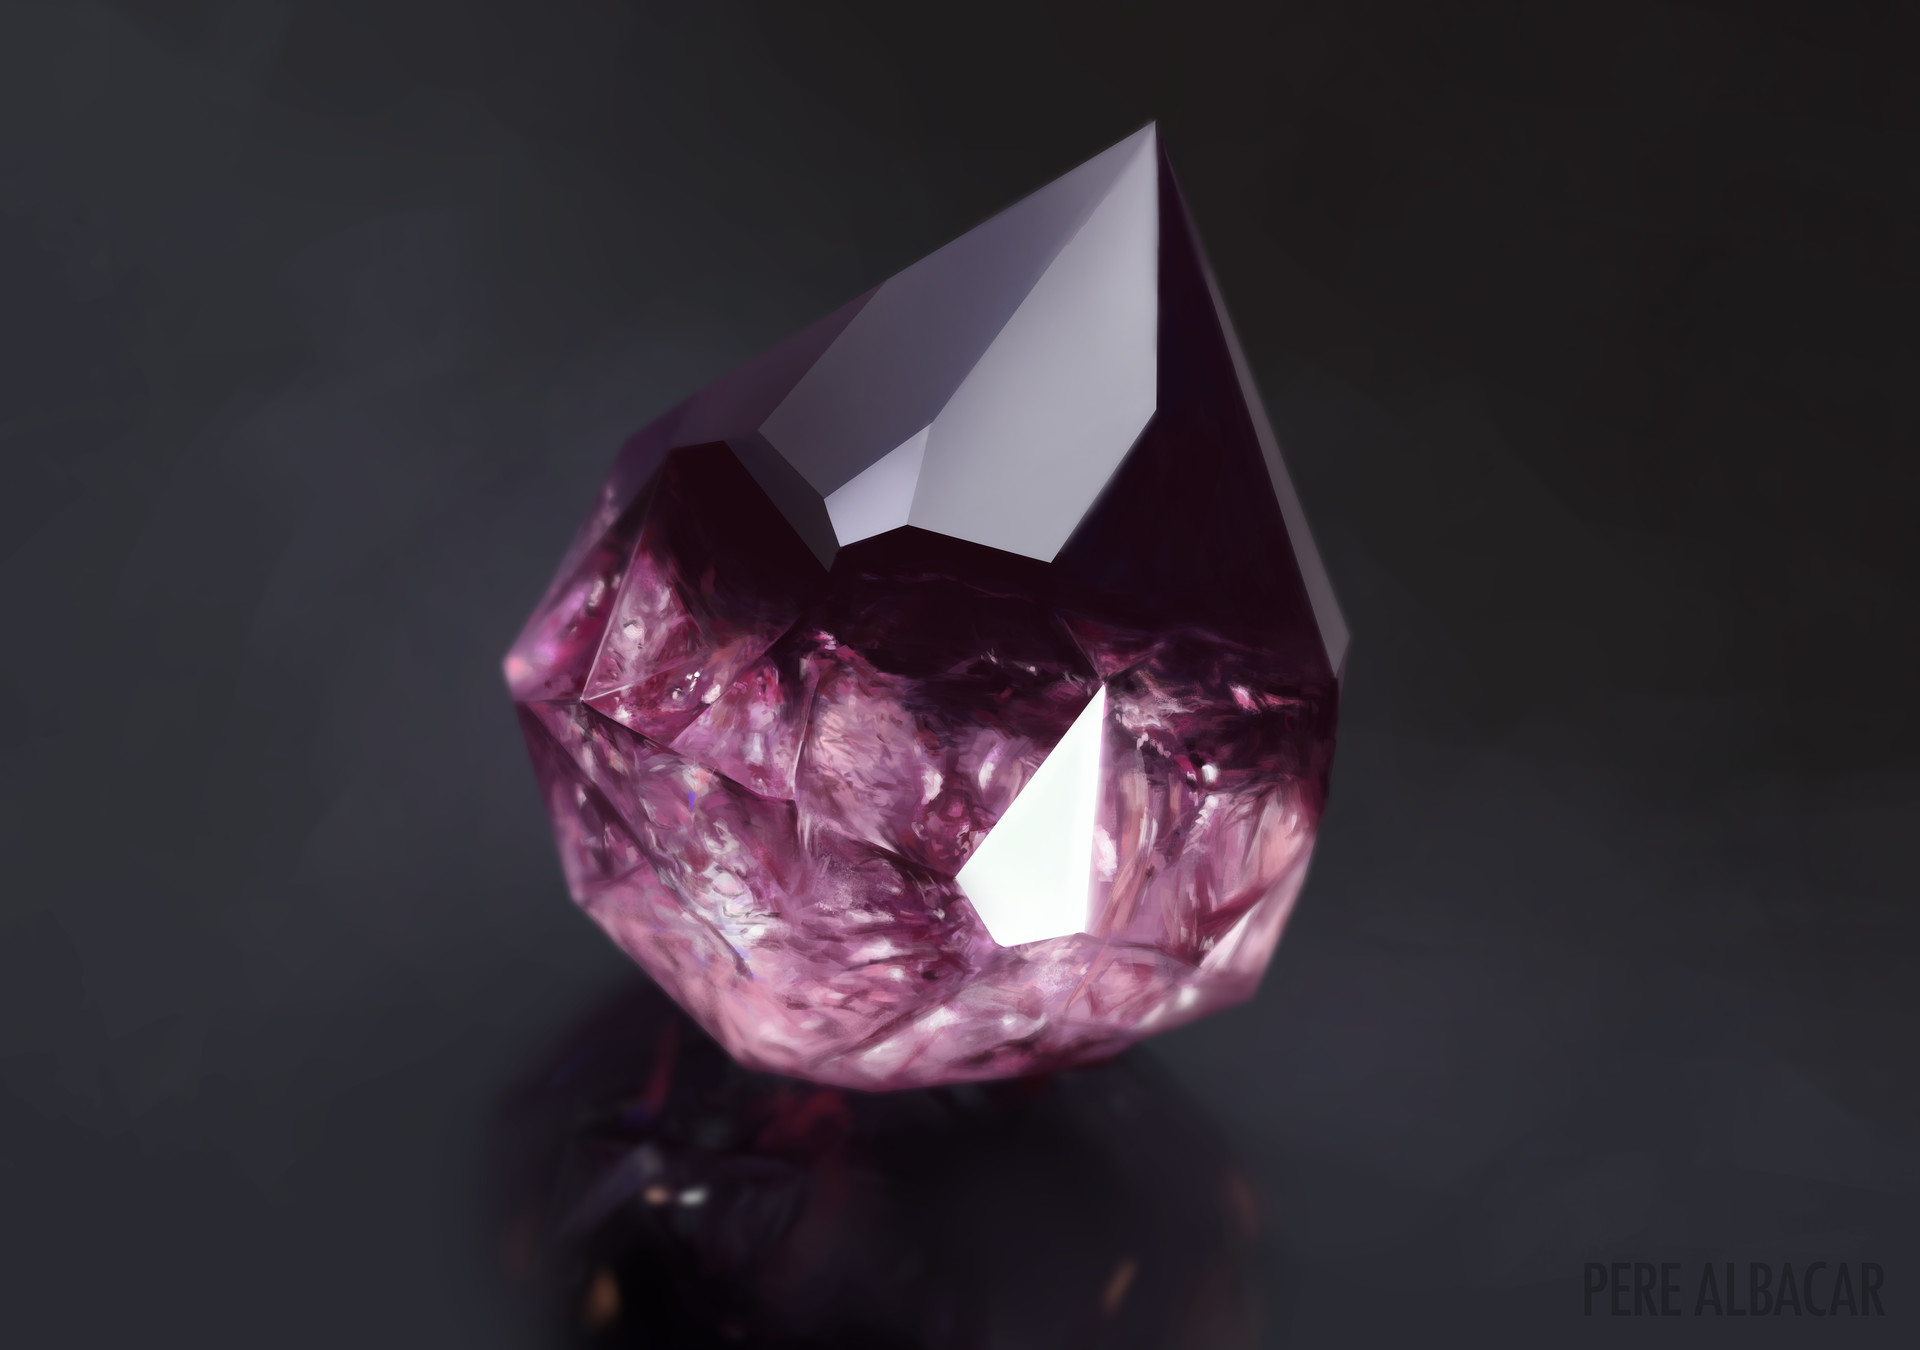 Pere albacar roda the gem by lgralh dacsqfa